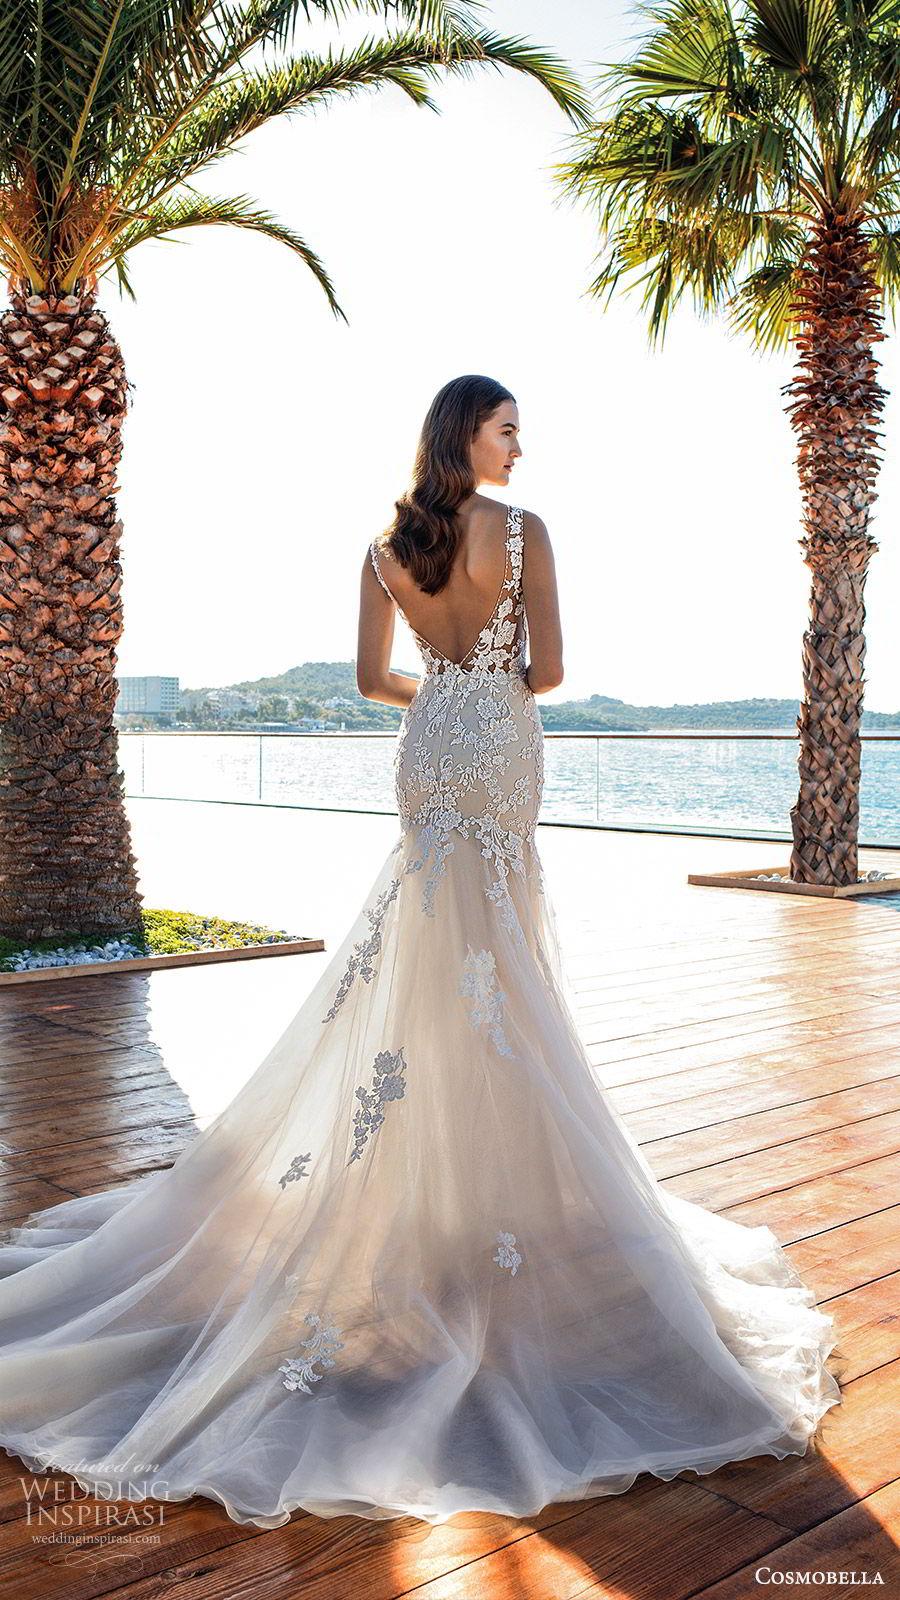 cosmobella 2020 bridal sleeveless sheer straps v neckline fully embellished lace trumpet fit flare wedding dress (5) romantic elegant low back chapel train bv